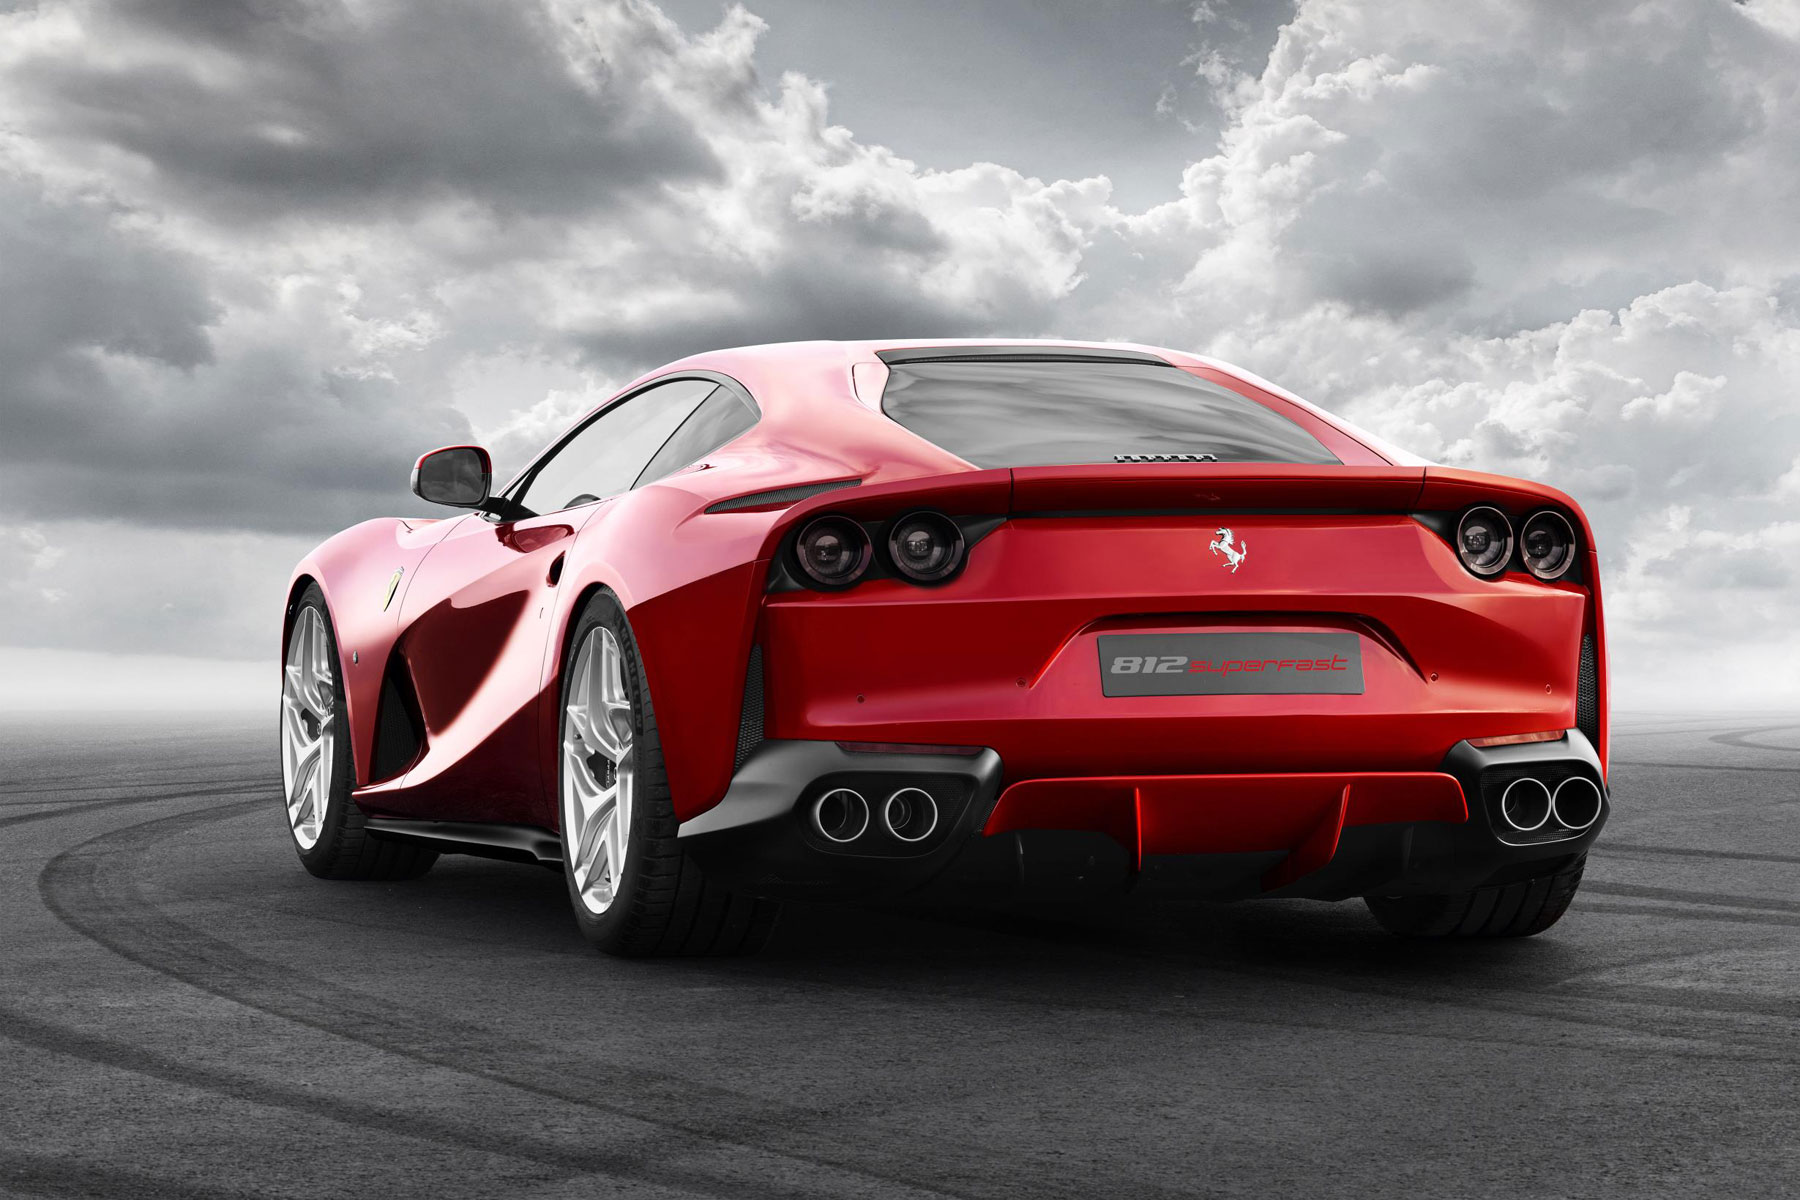 Ferrari 812 Superfast – 2.9 seconds